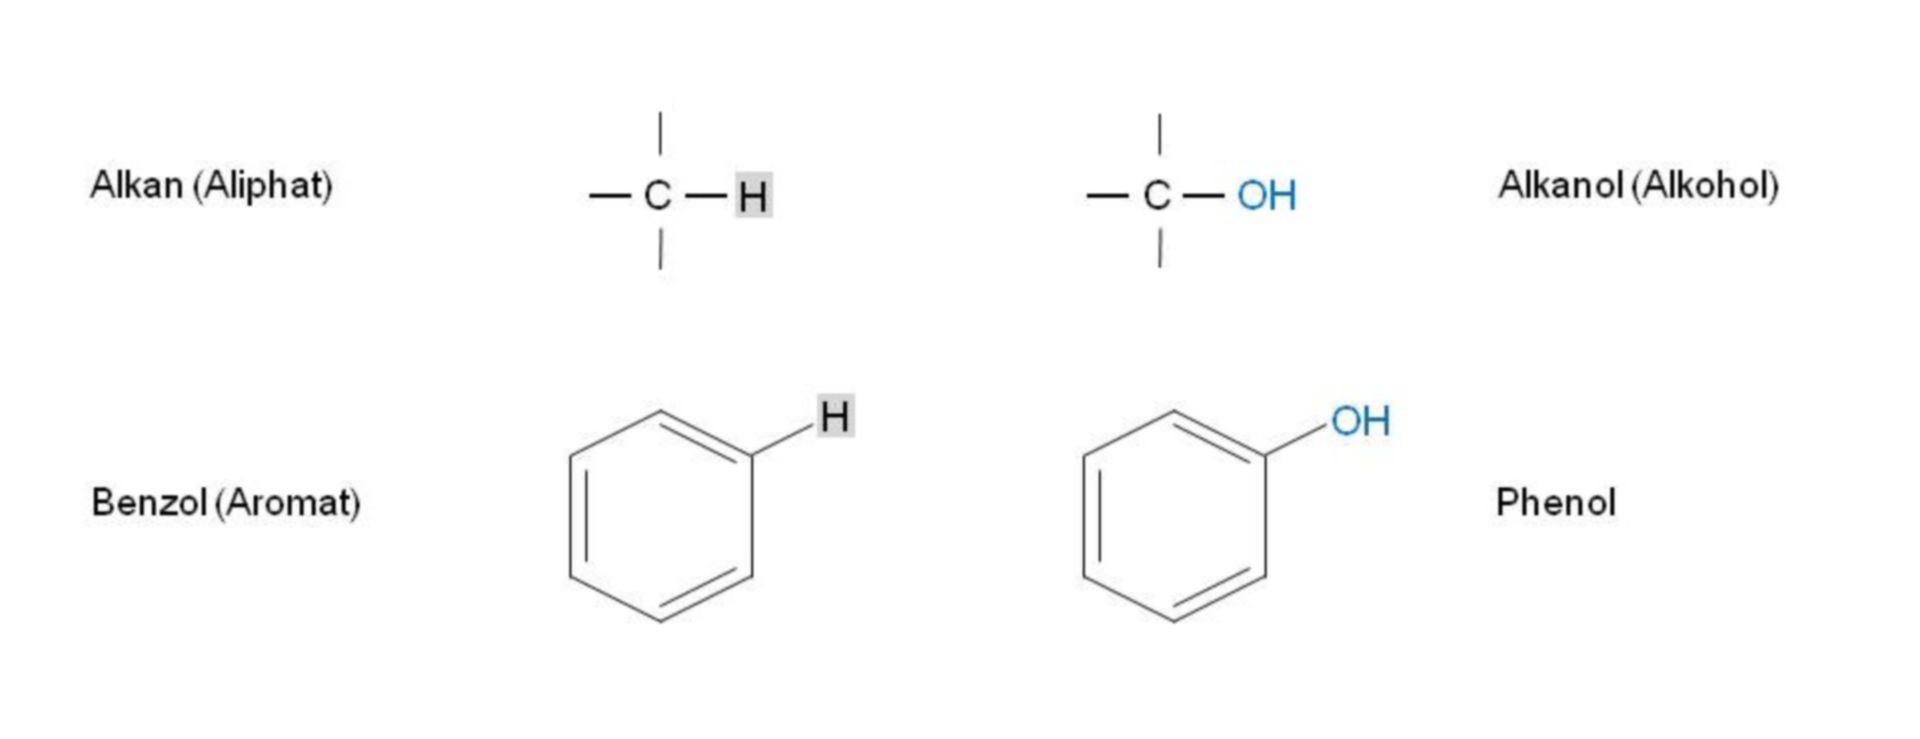 Hydroxide group